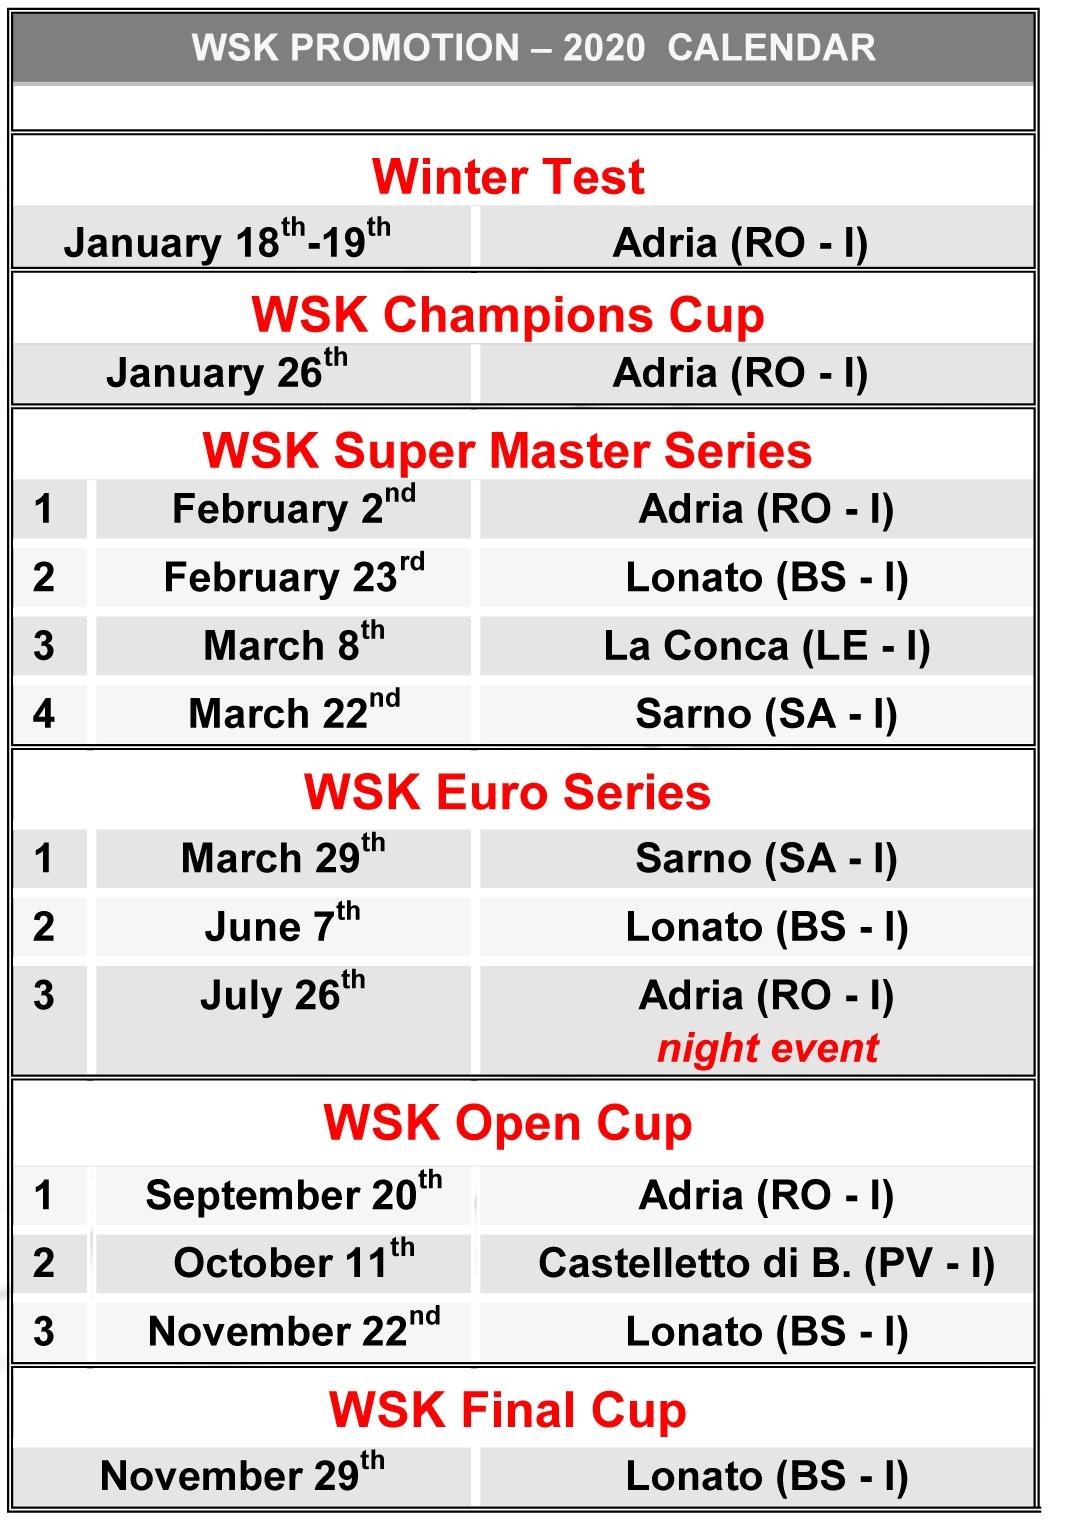 Wsk Promotion Announces Its Calendar For 2020 Season